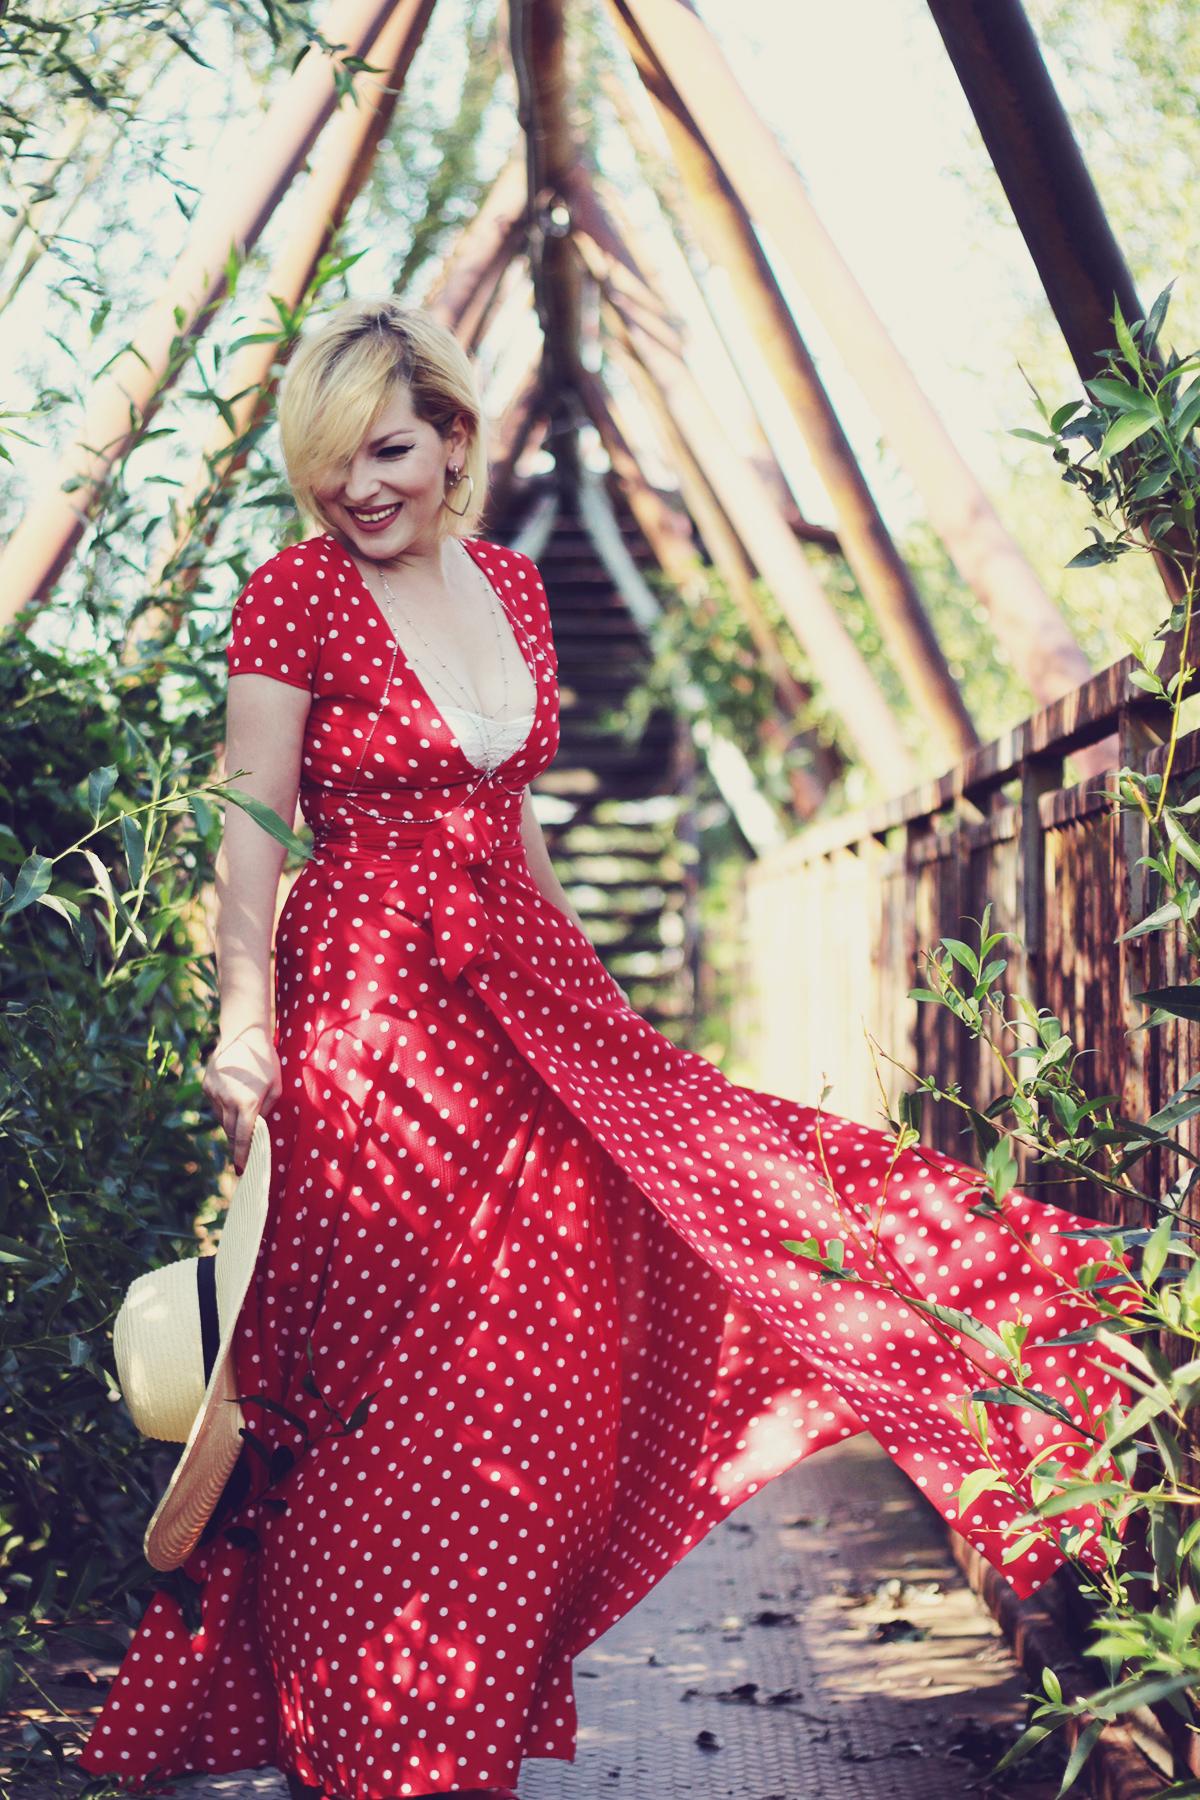 red polka dot maxi dress, summer, straw hat, body chain